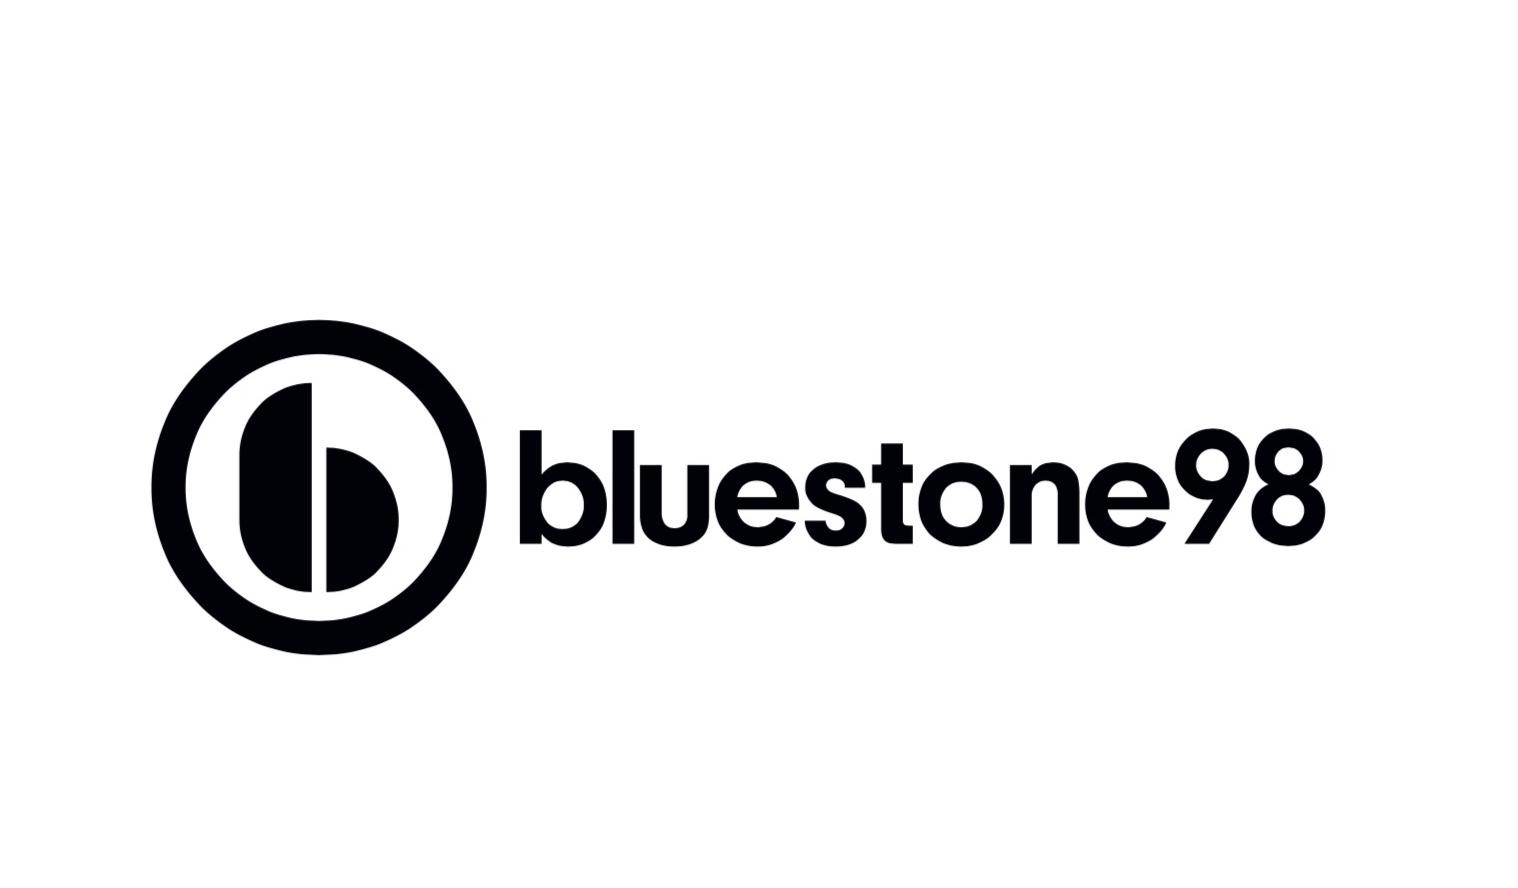 Bluestone 98